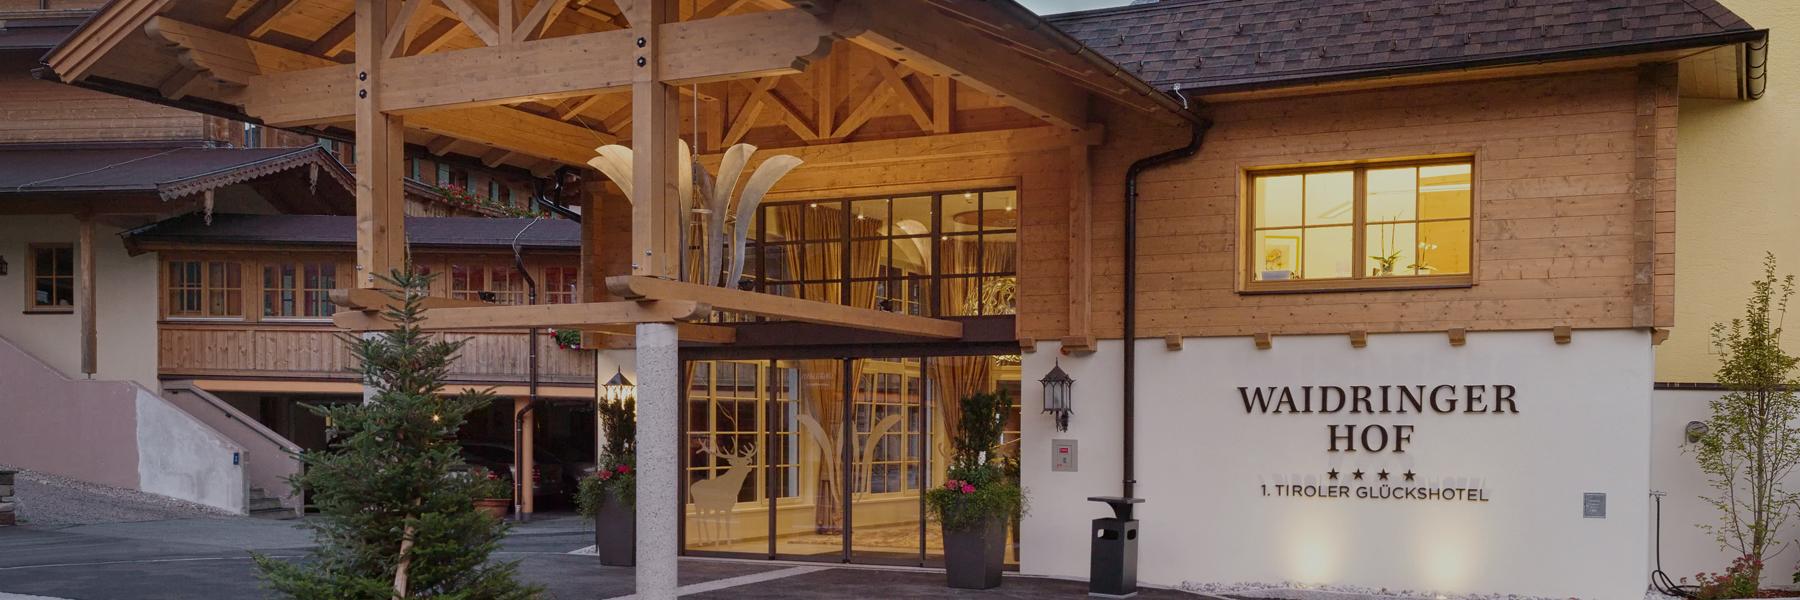 4-Sterne-Superior Hotel in den Kitzbüheler Alpen: Der Waidringer Hof